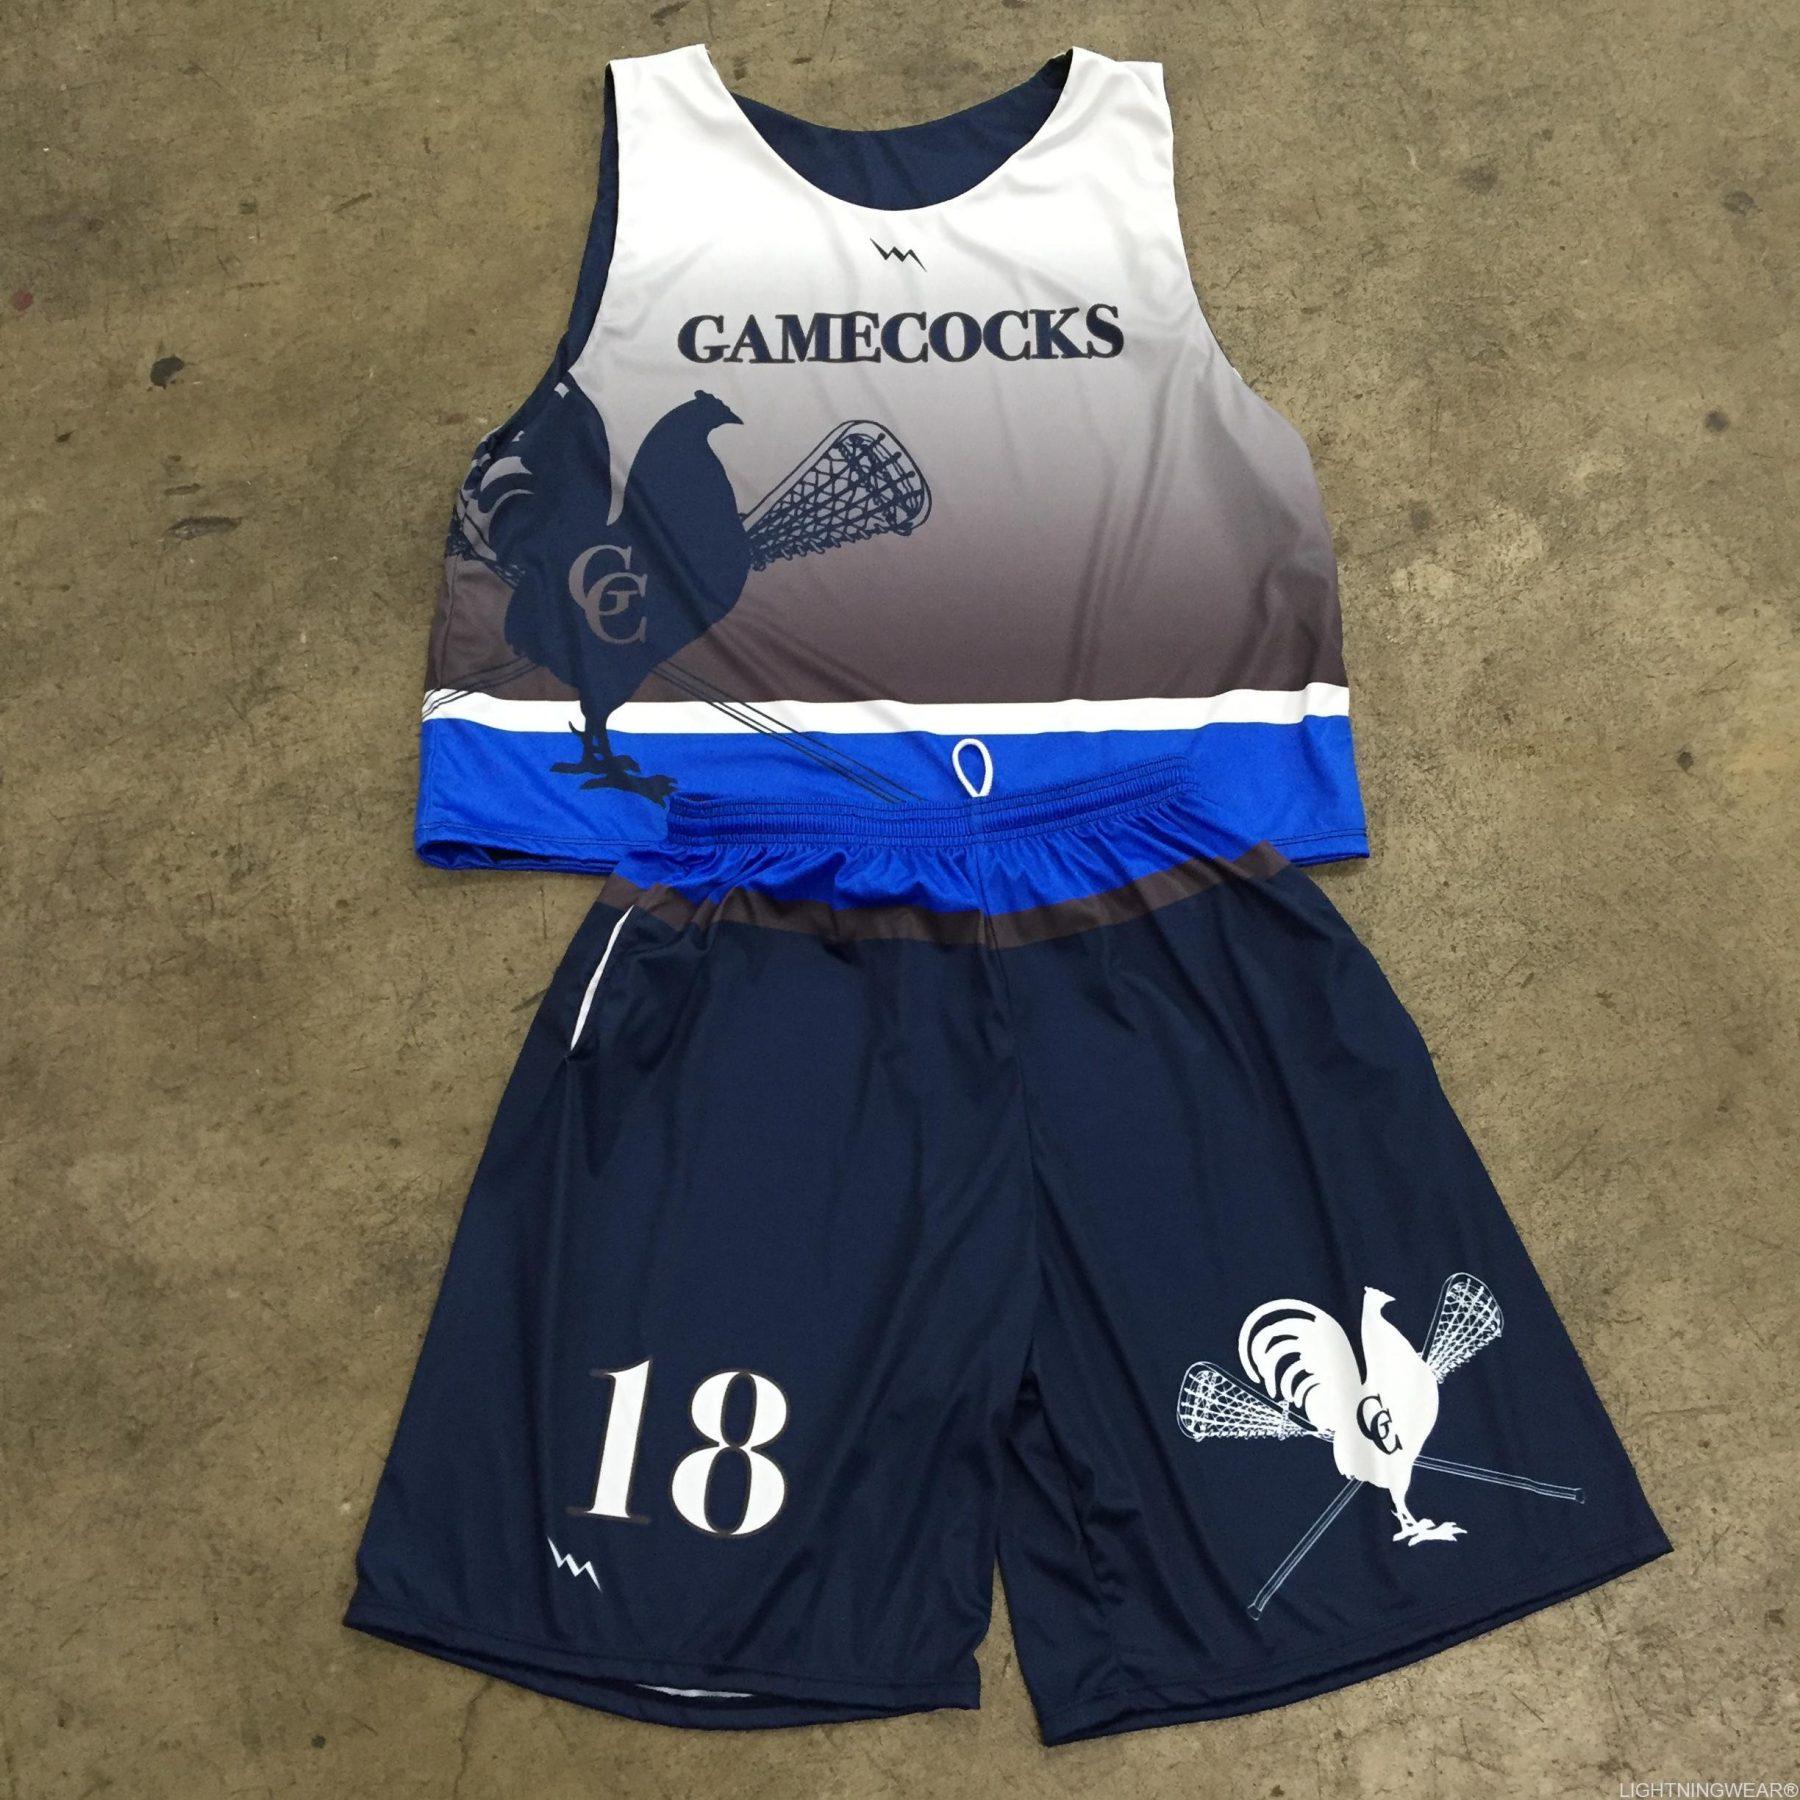 gamecocks lacrosse uniform